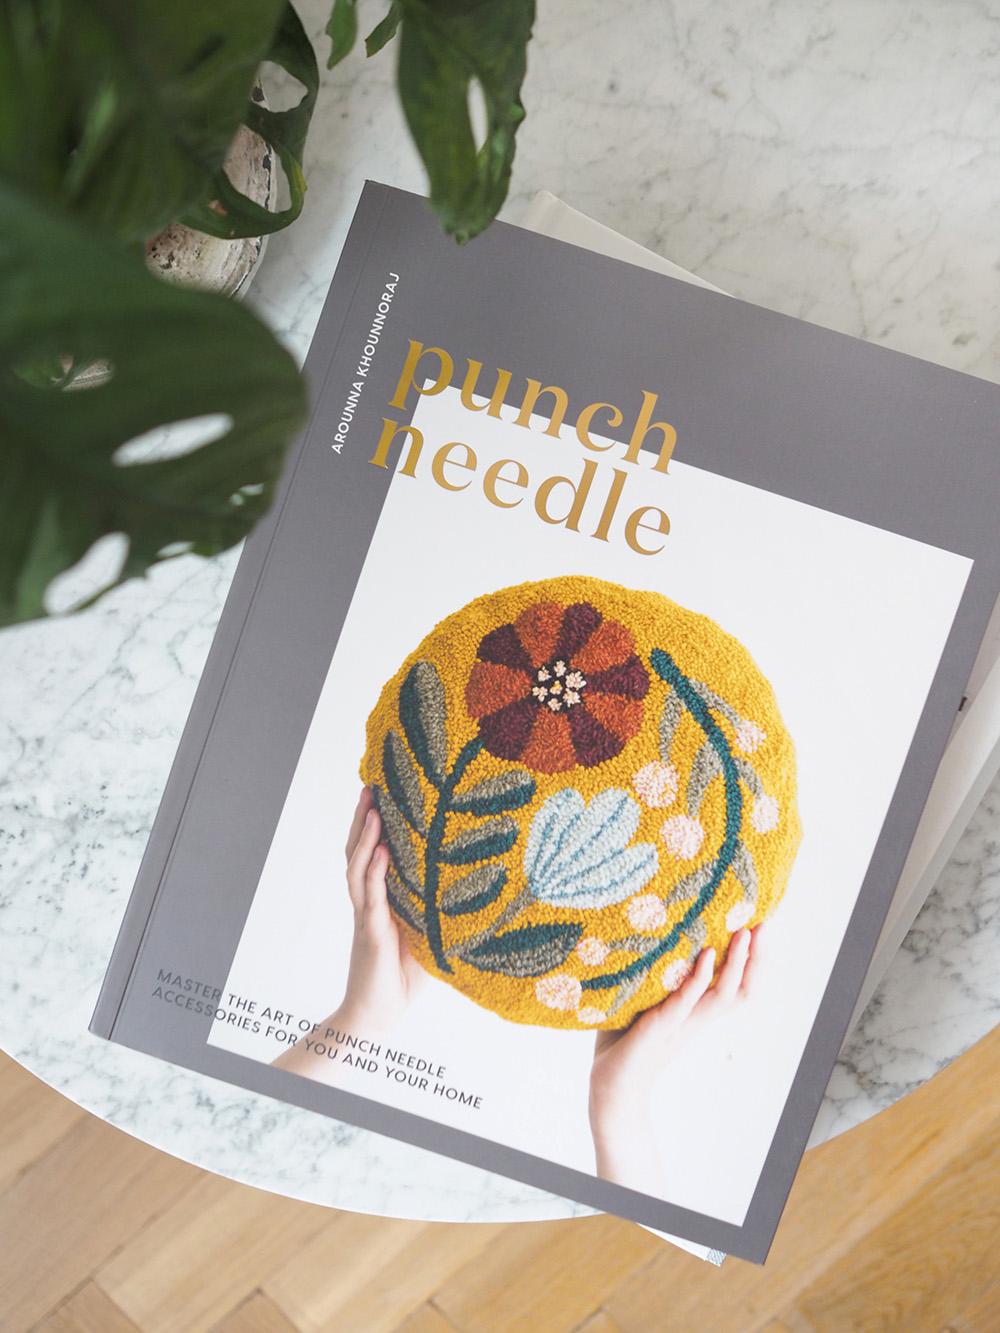 Punch Needle book by Arounna Khounnoraj